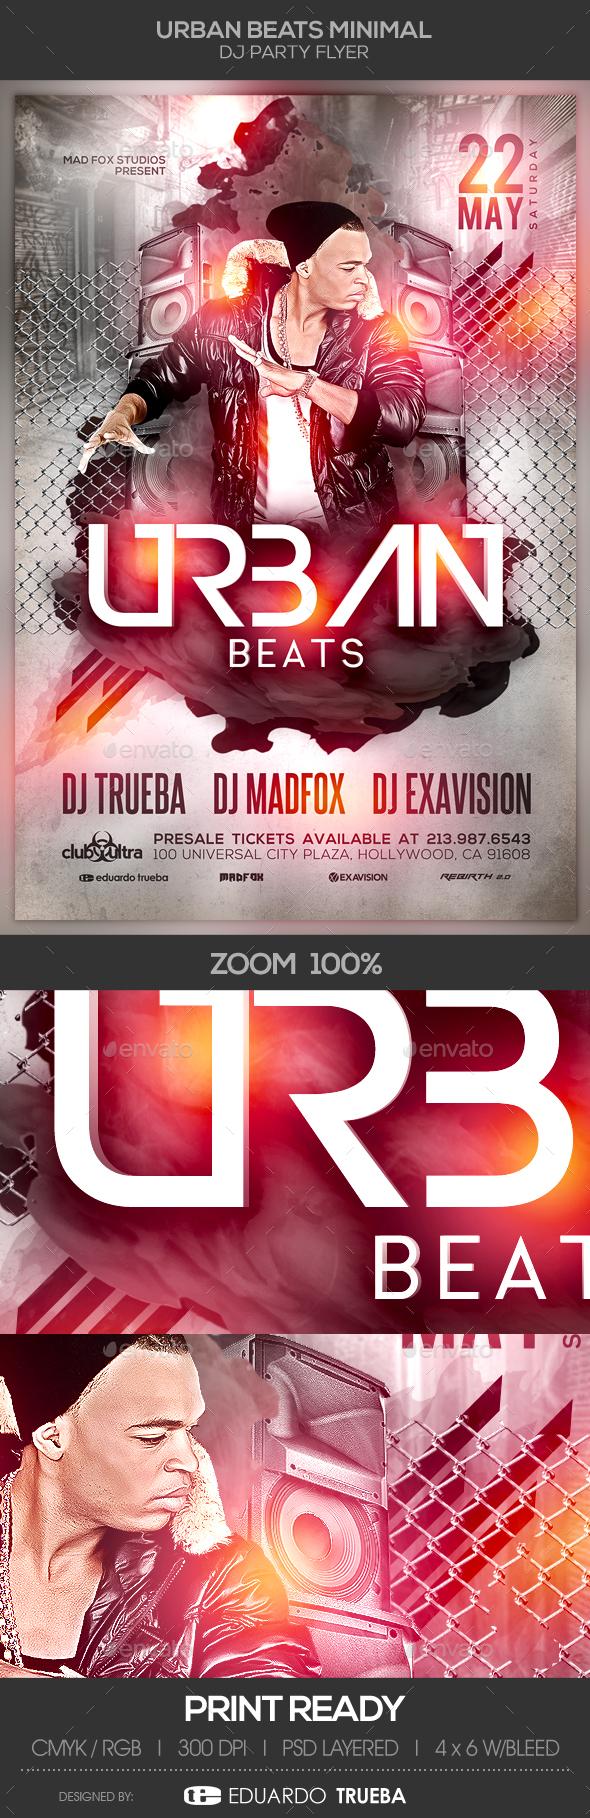 Urban Beats Minimal Dj Party Flyer - Clubs & Parties Events